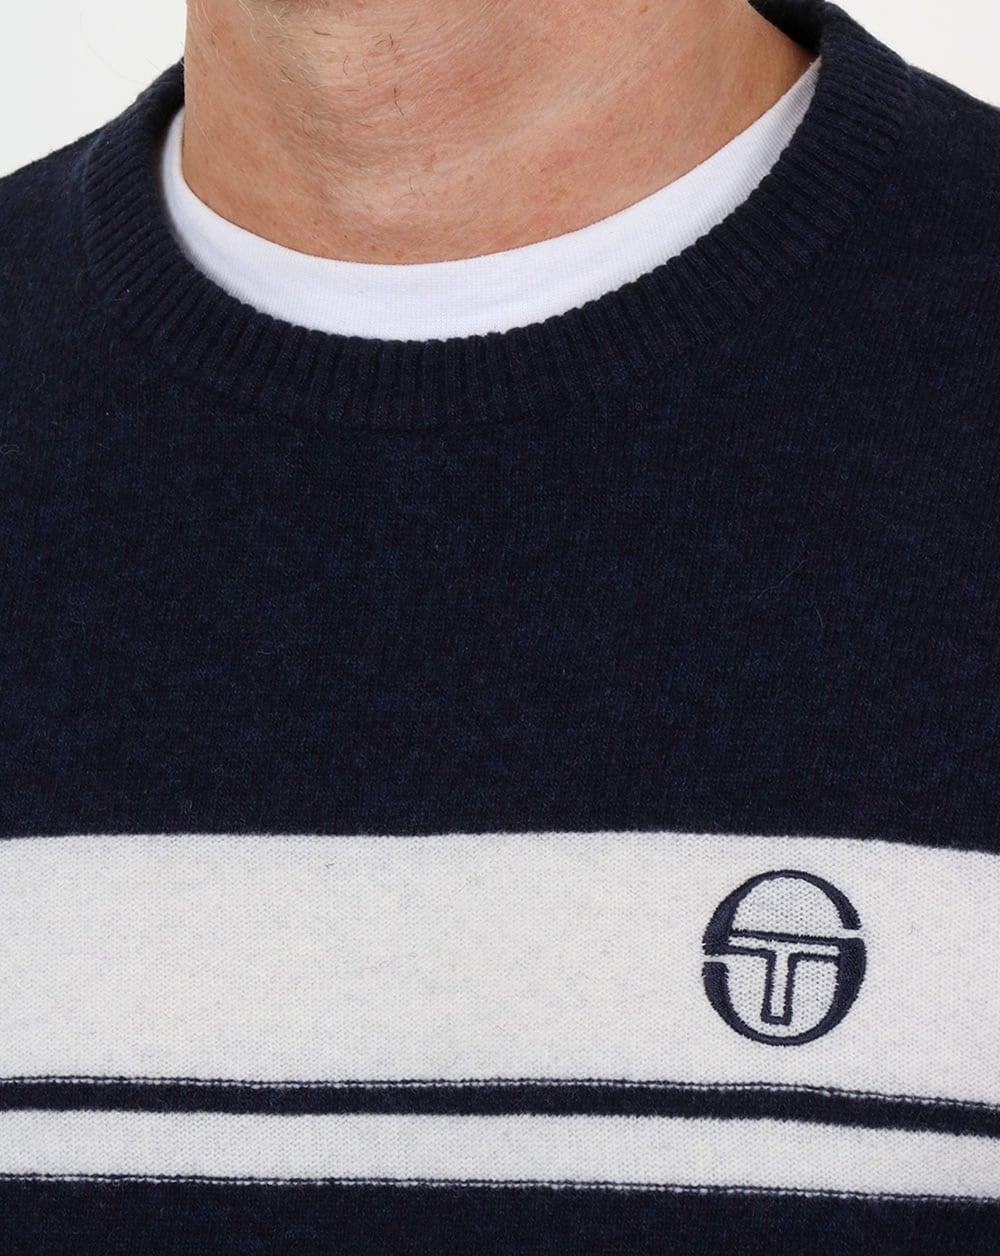 Sergio Tacchini Young Line Jumper NavyIvory